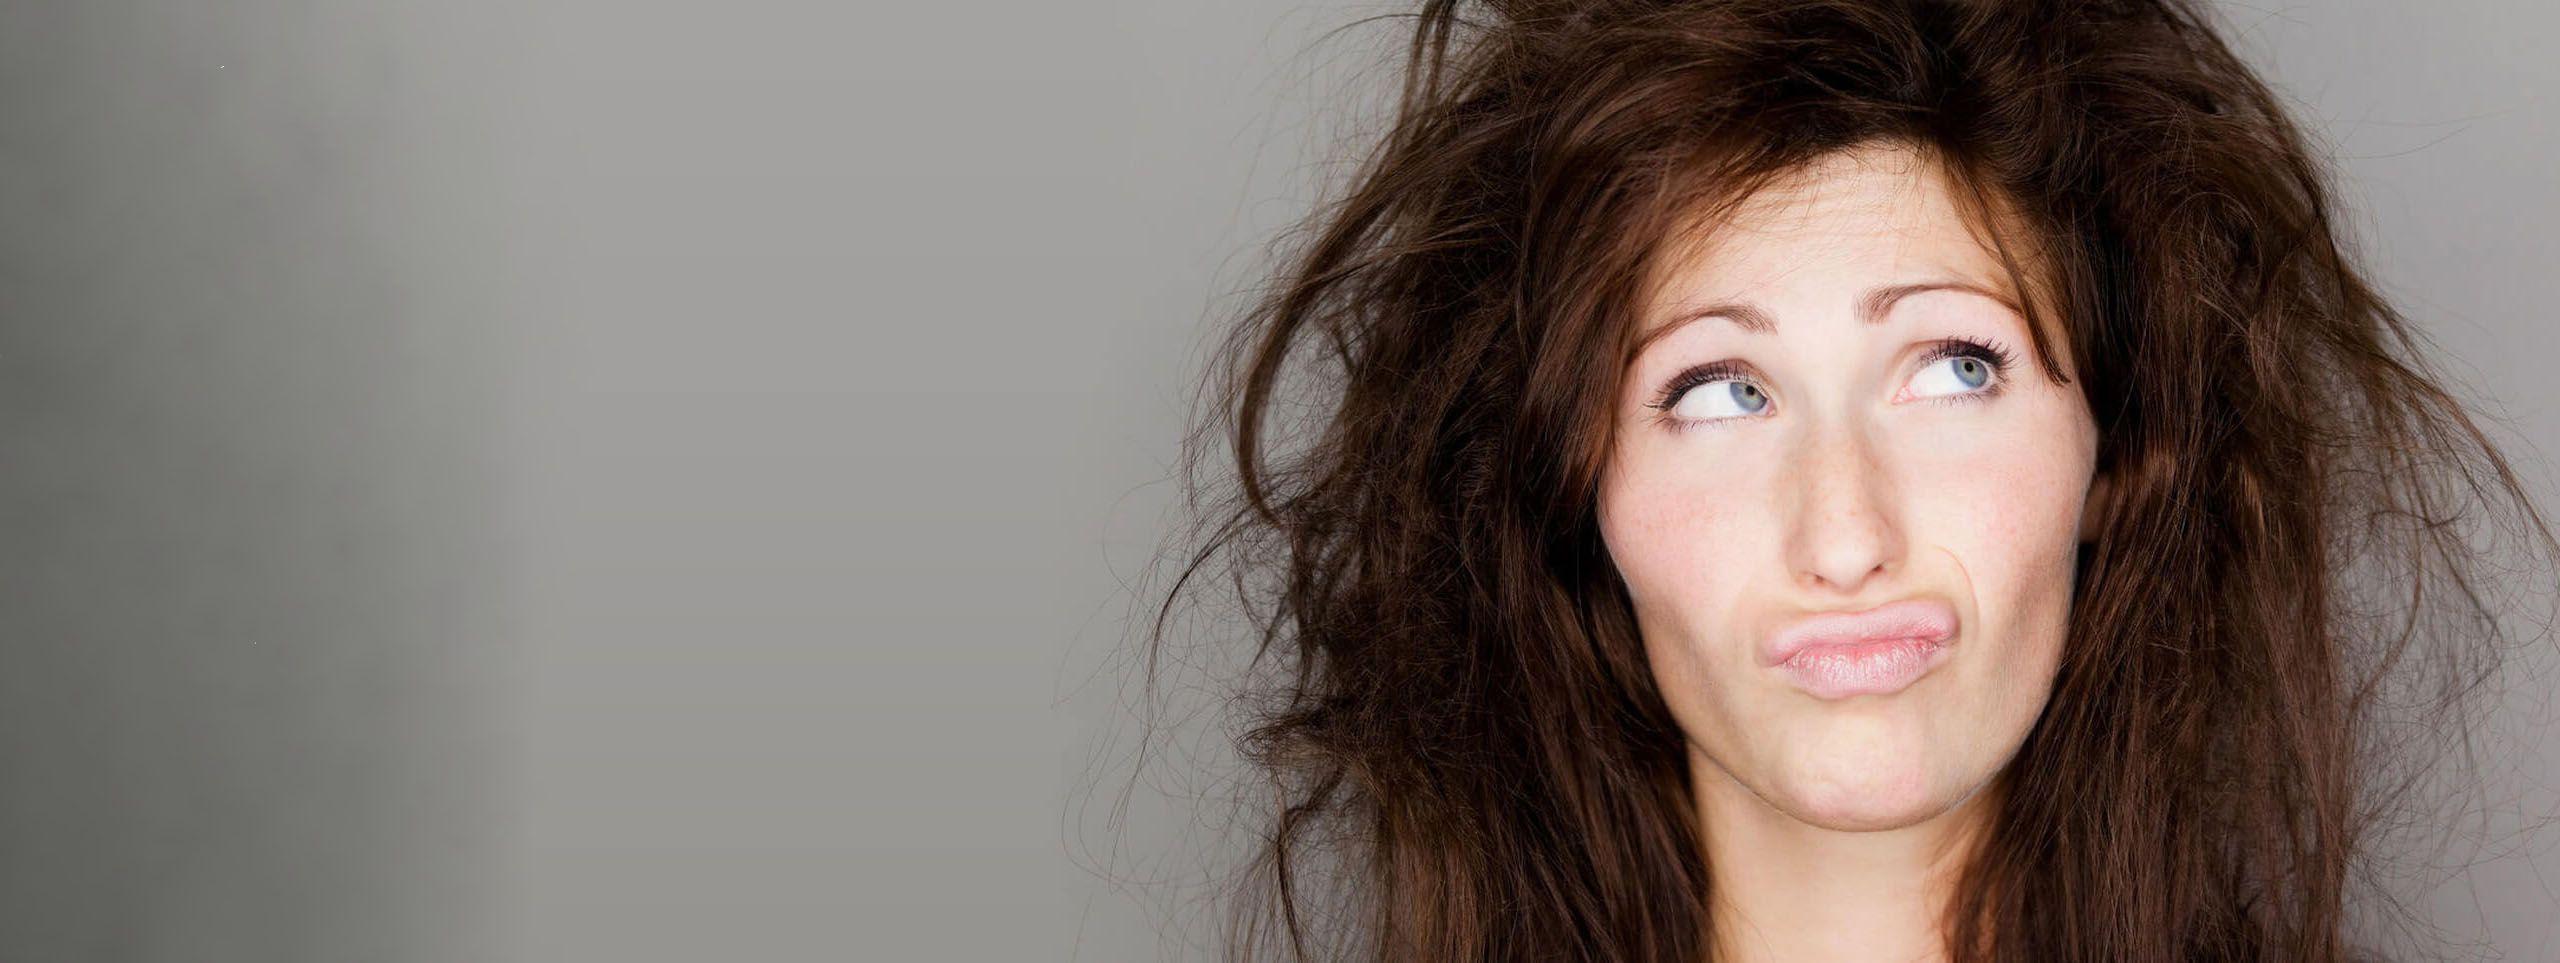 Femme brune cheveux en pétard